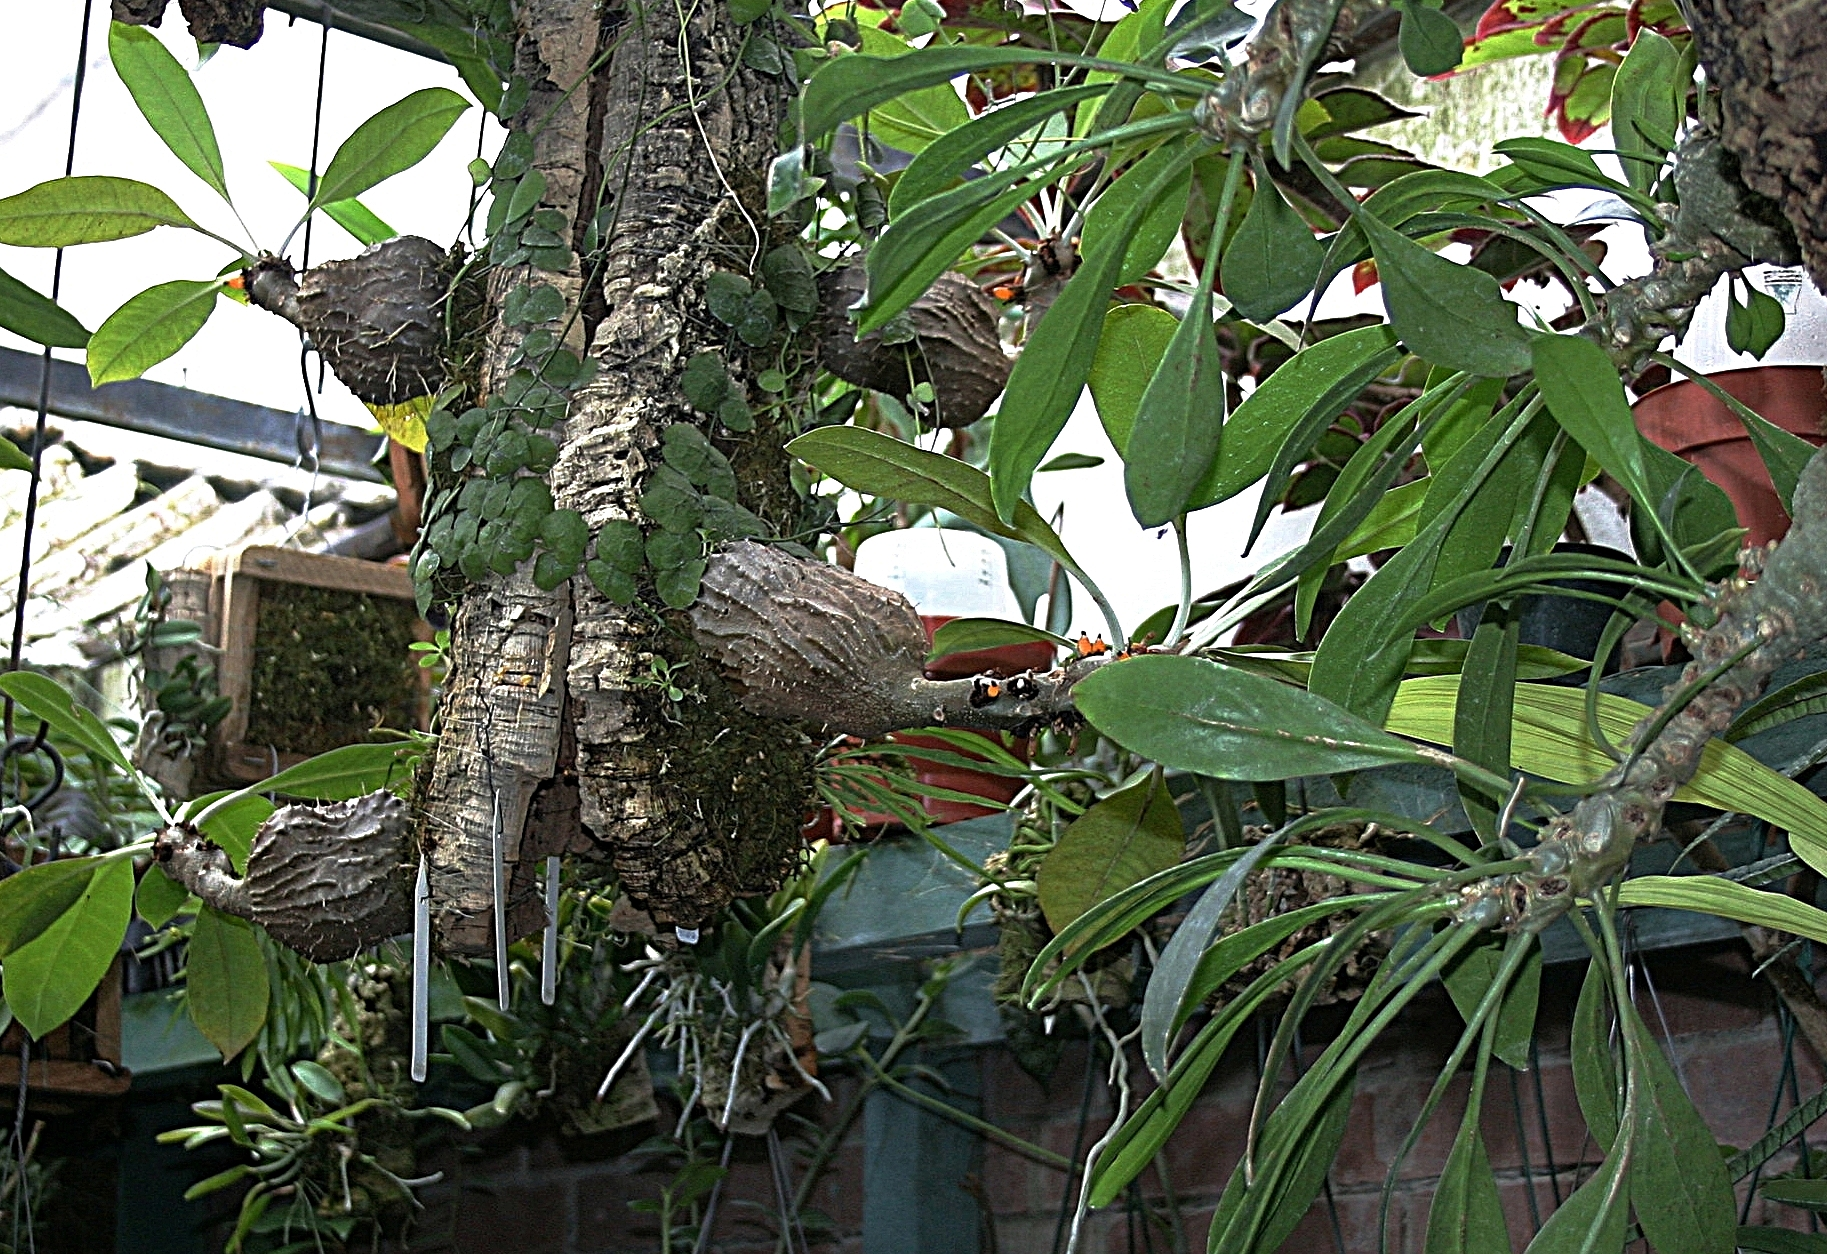 "Young mature examples of Tropiflora's forms of  Mymecodia tuberosa bracteata ,  M. tuberosa armata  and  M. beccari i ""Hull River' growing mounted on cork tubes in an indoor atrium in Guatemala, 2008."